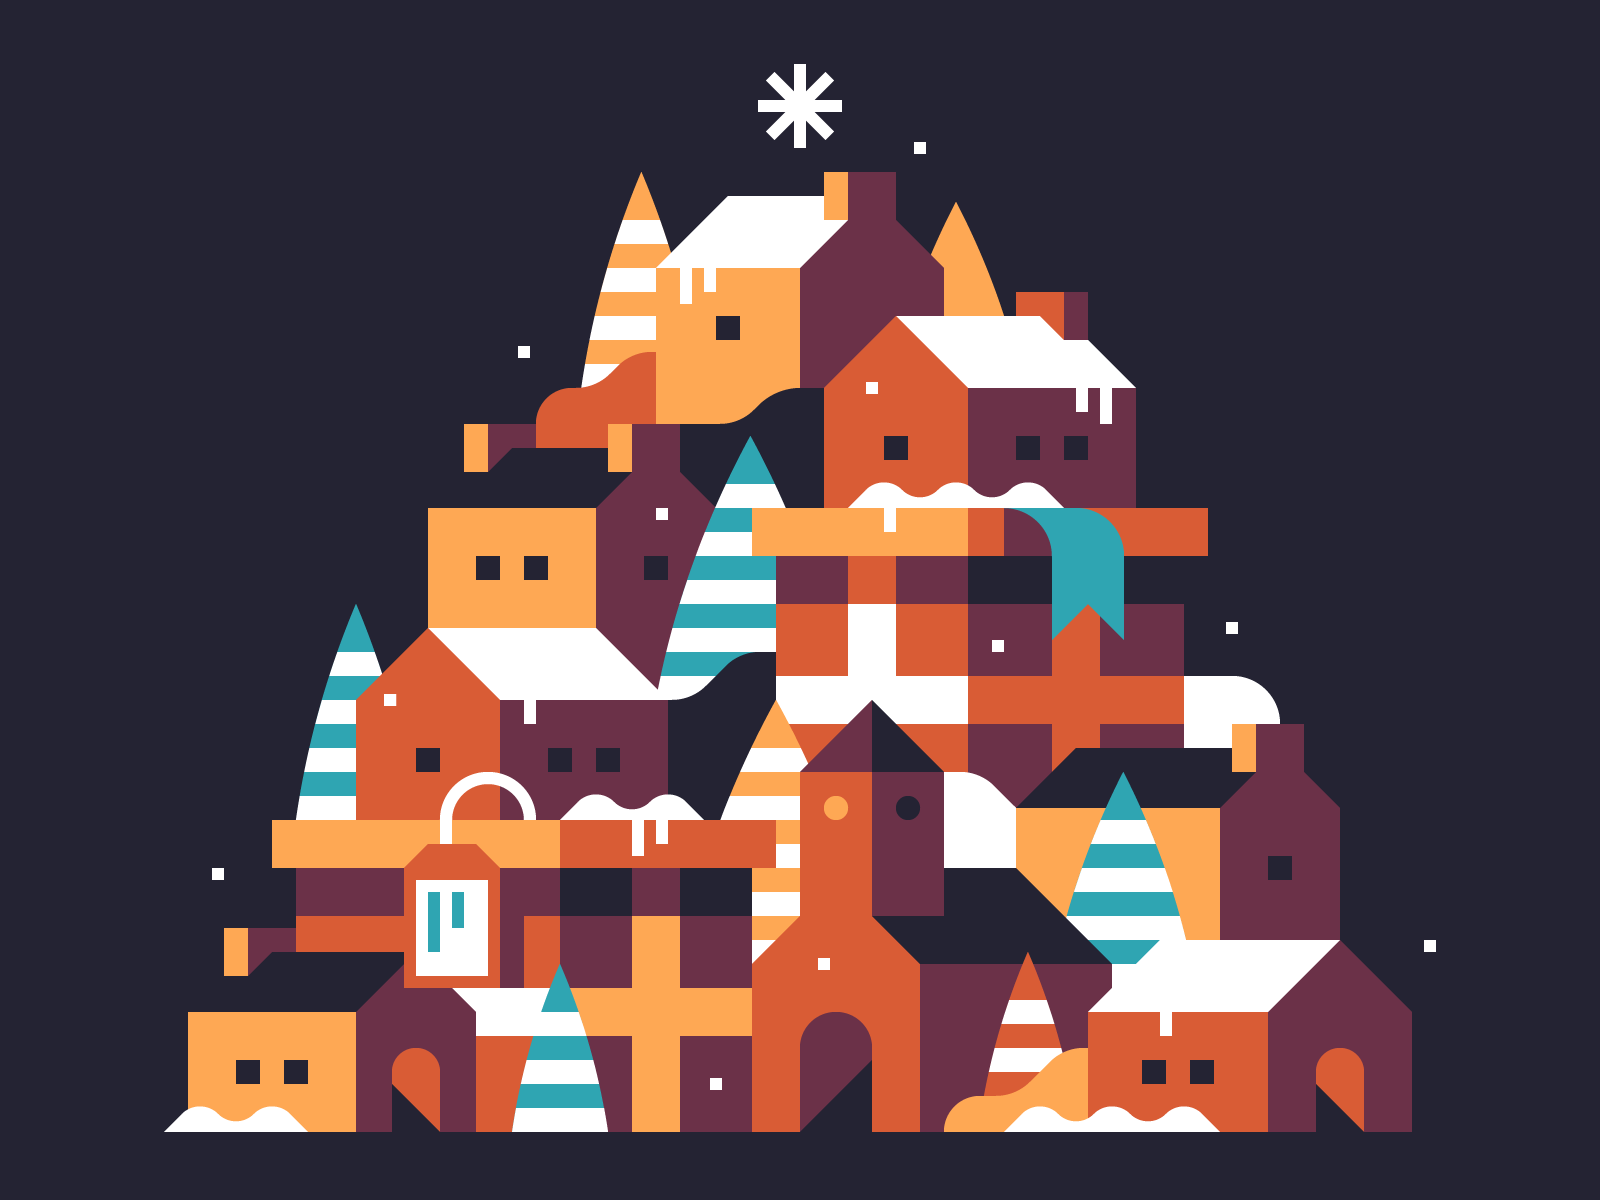 2018 Holiday Card illustration by Alex Pasquarella